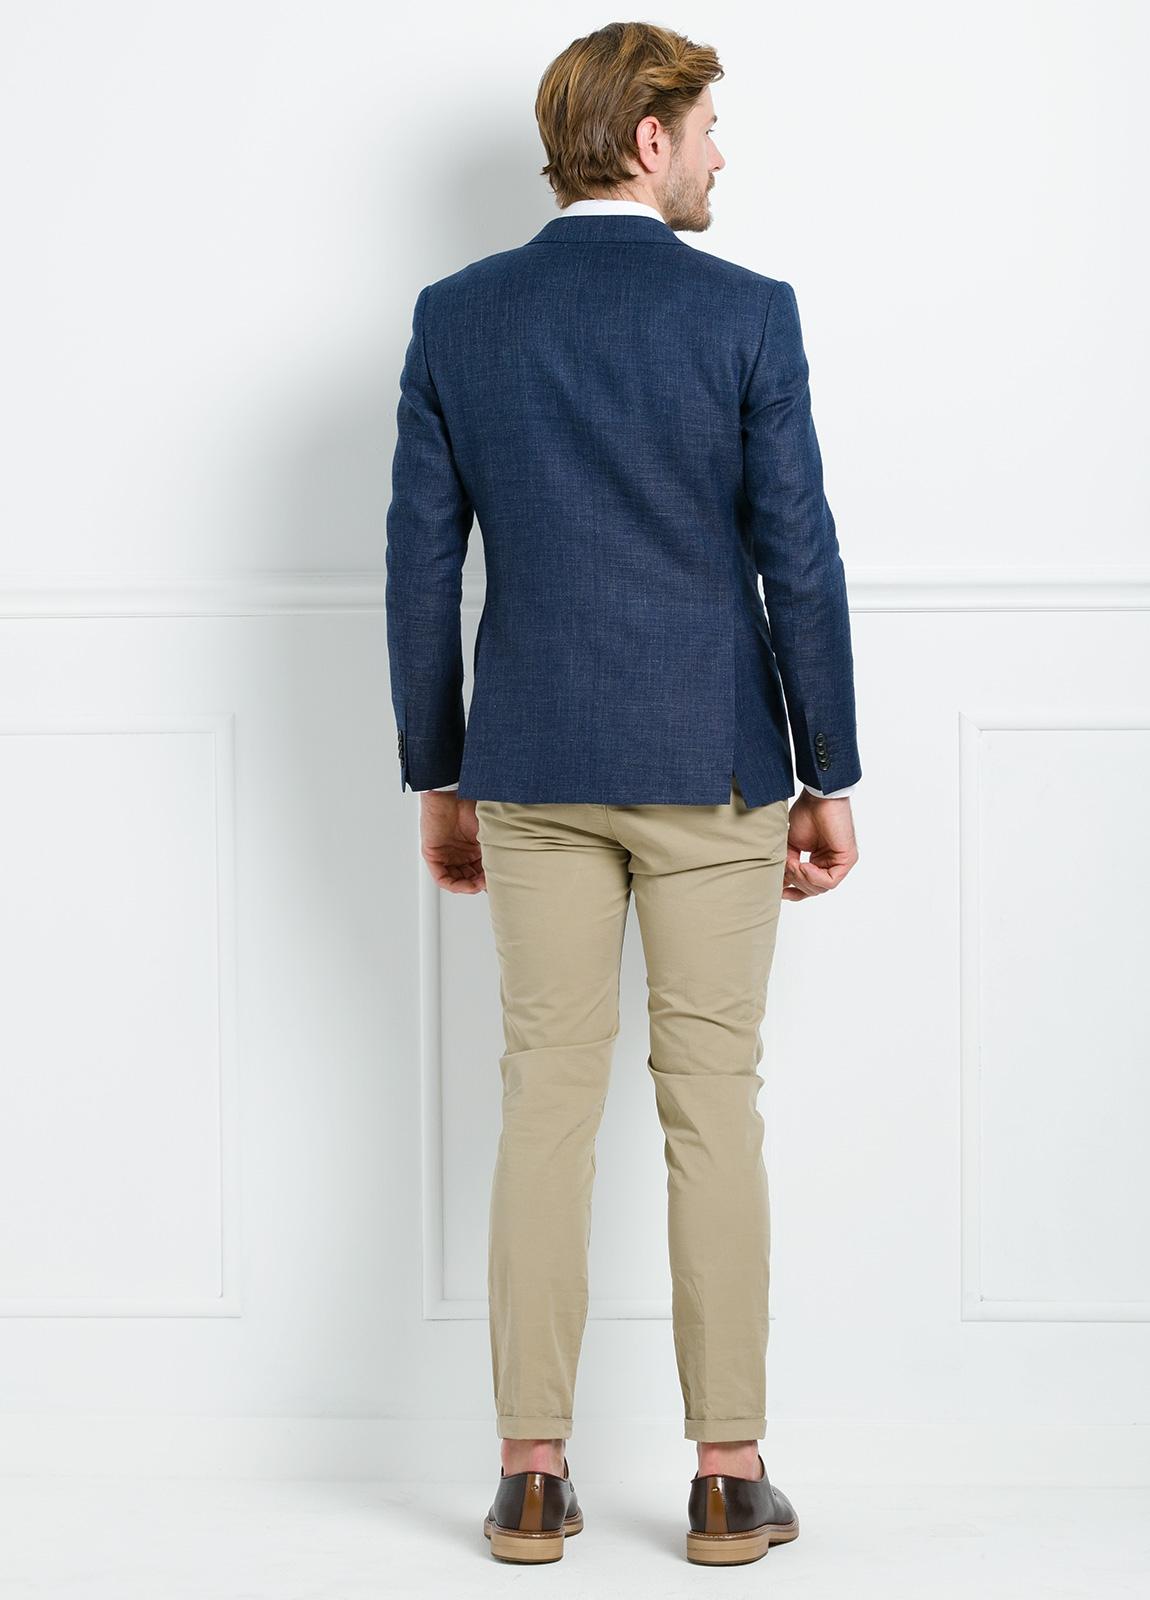 Americana Slim Fit color azul marino. 55% Lino 45% Lana. - Ítem3